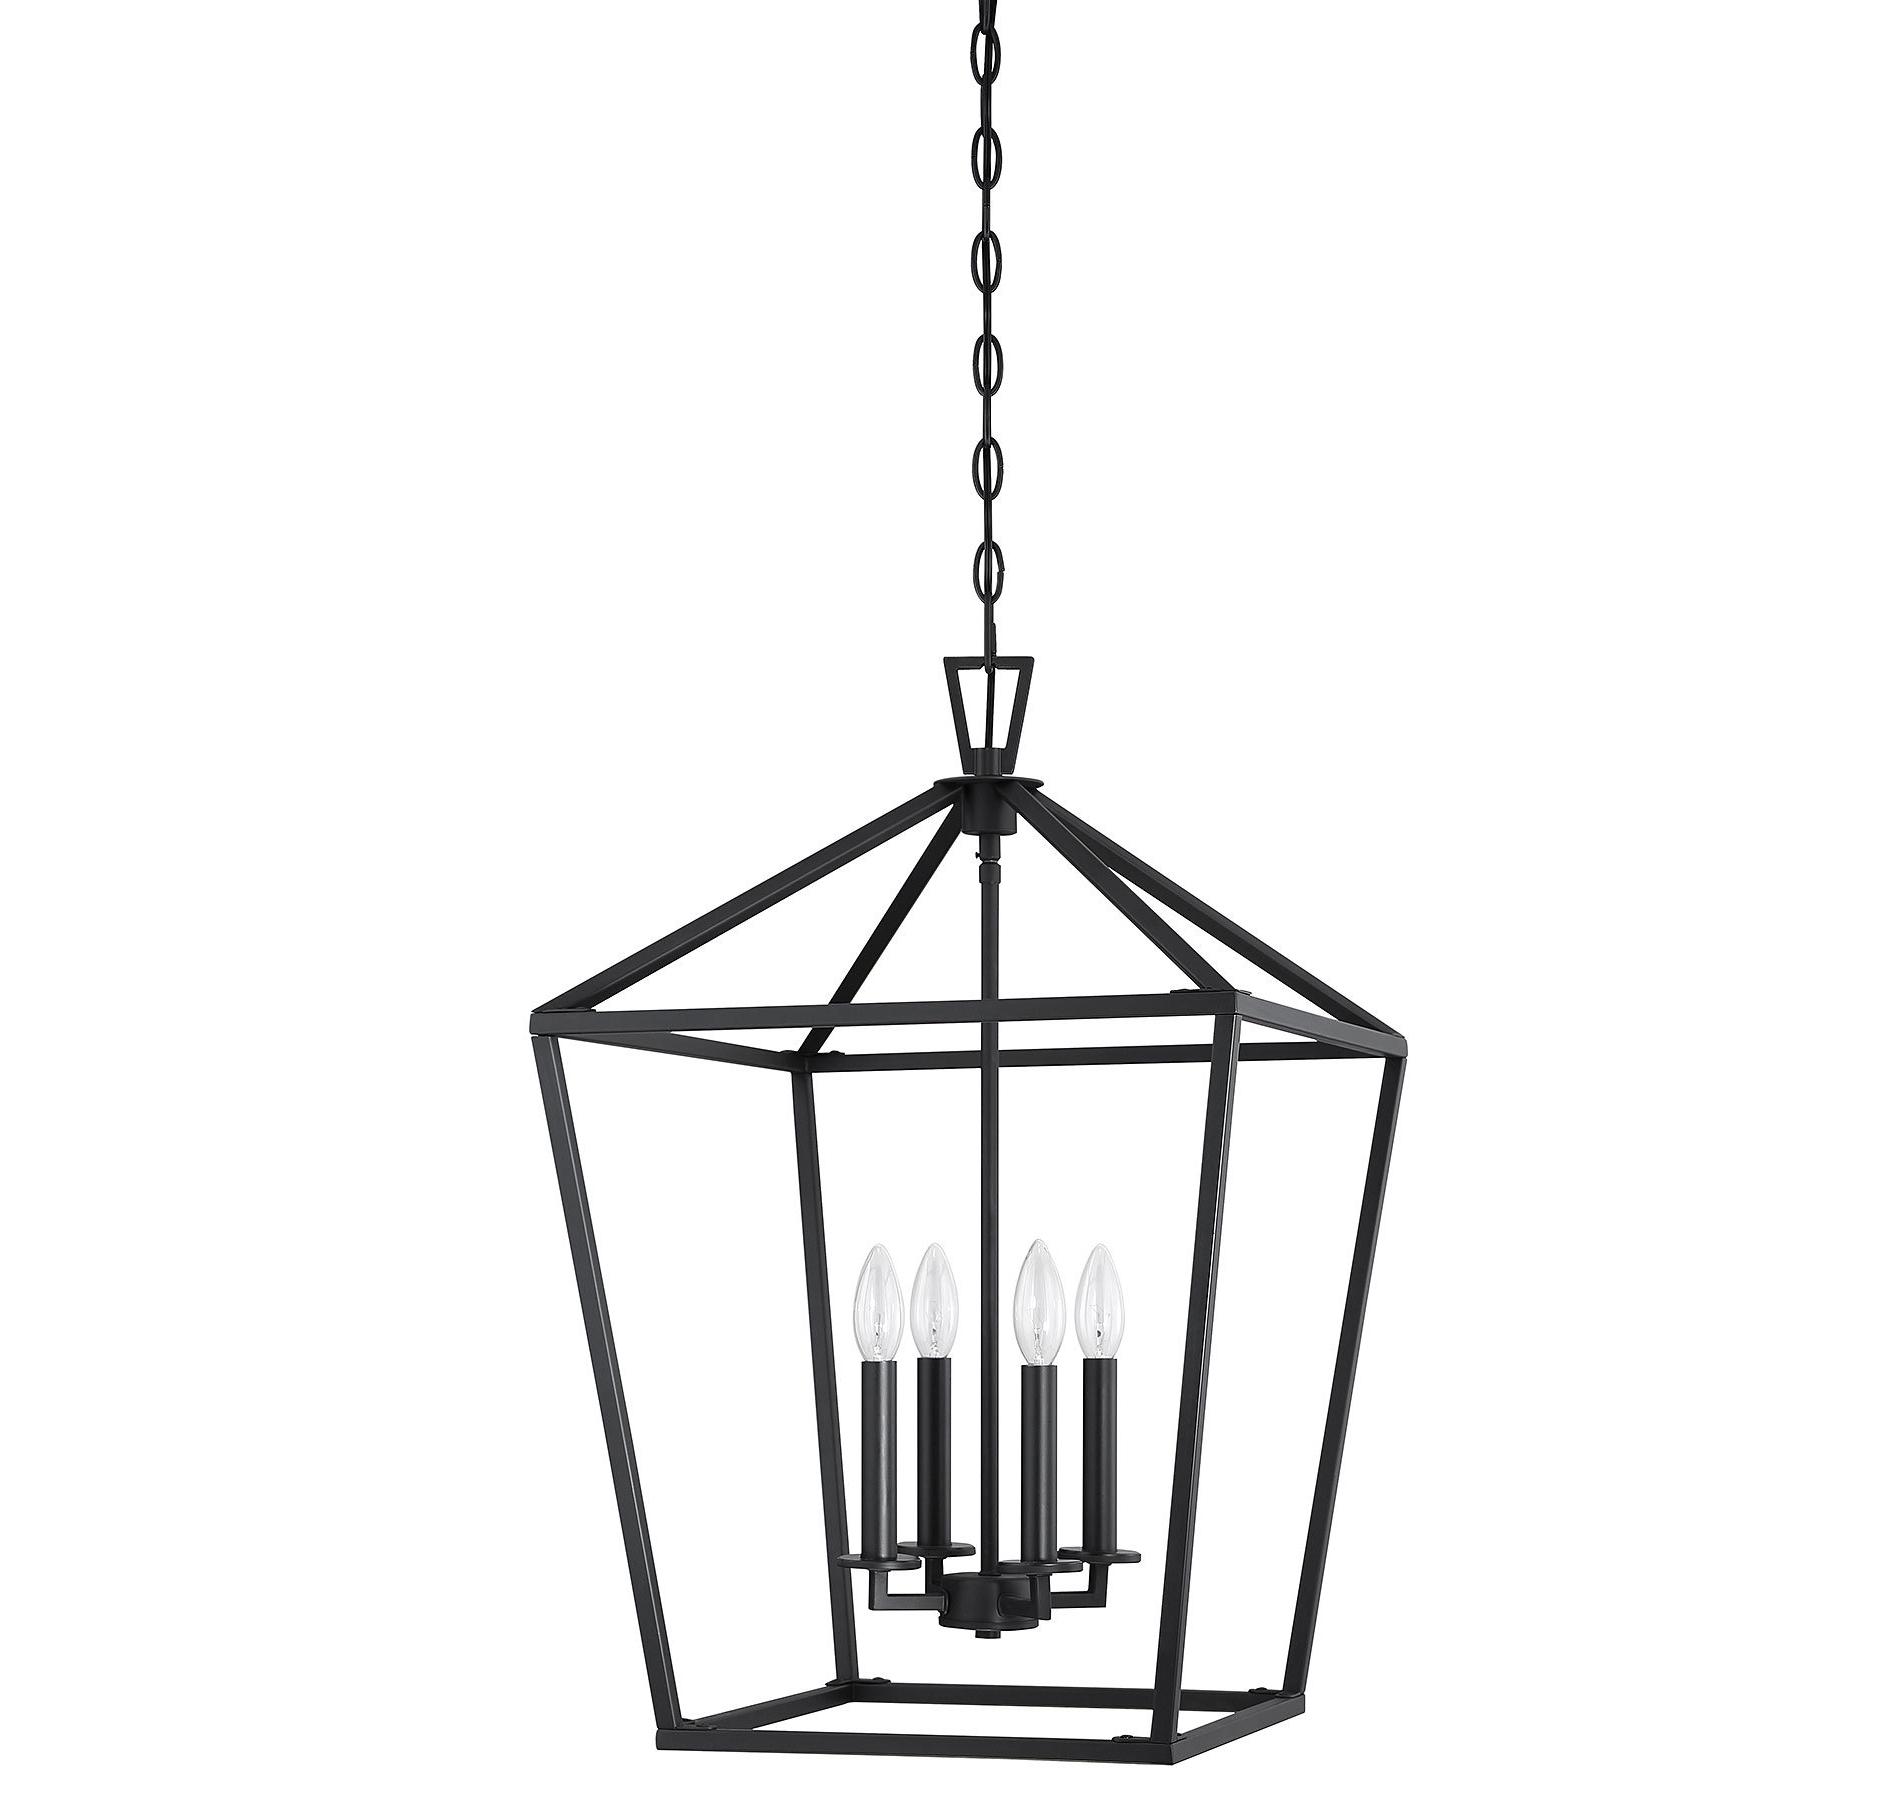 Israel 4 Light Lantern Chandelier Throughout Popular Varnum 4 Light Lantern Pendants (View 10 of 25)